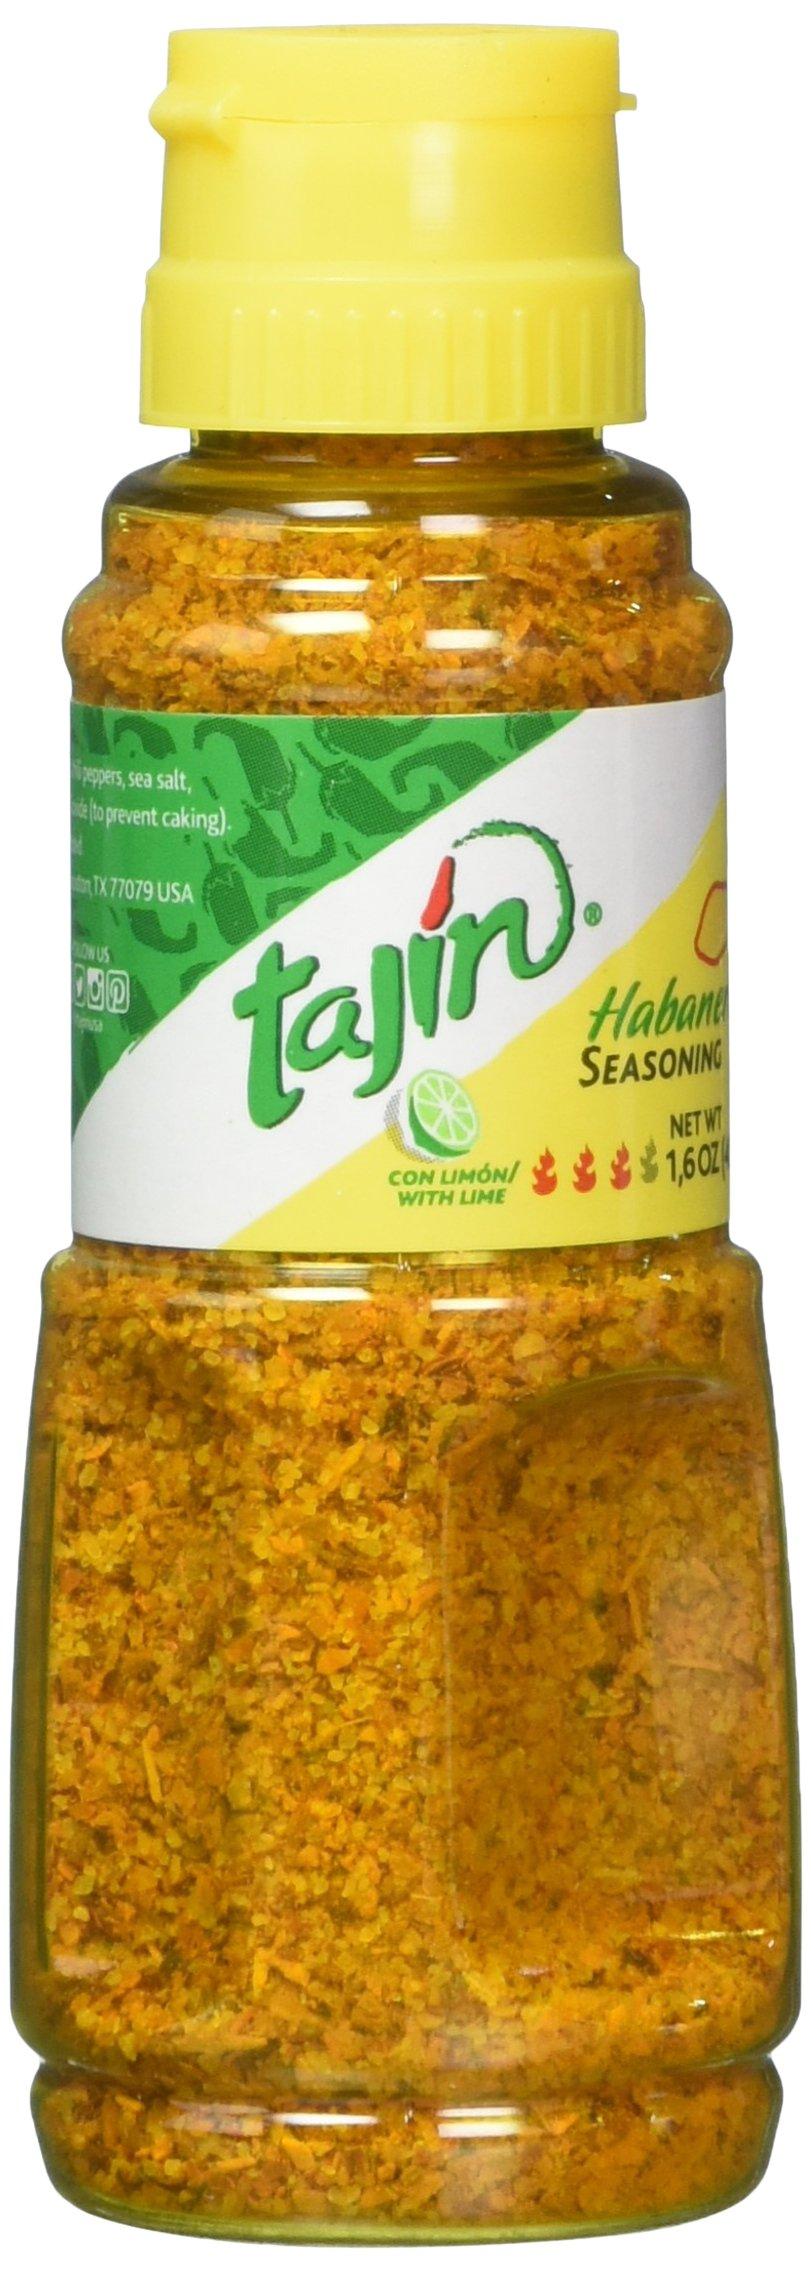 how to make tajin seasoning